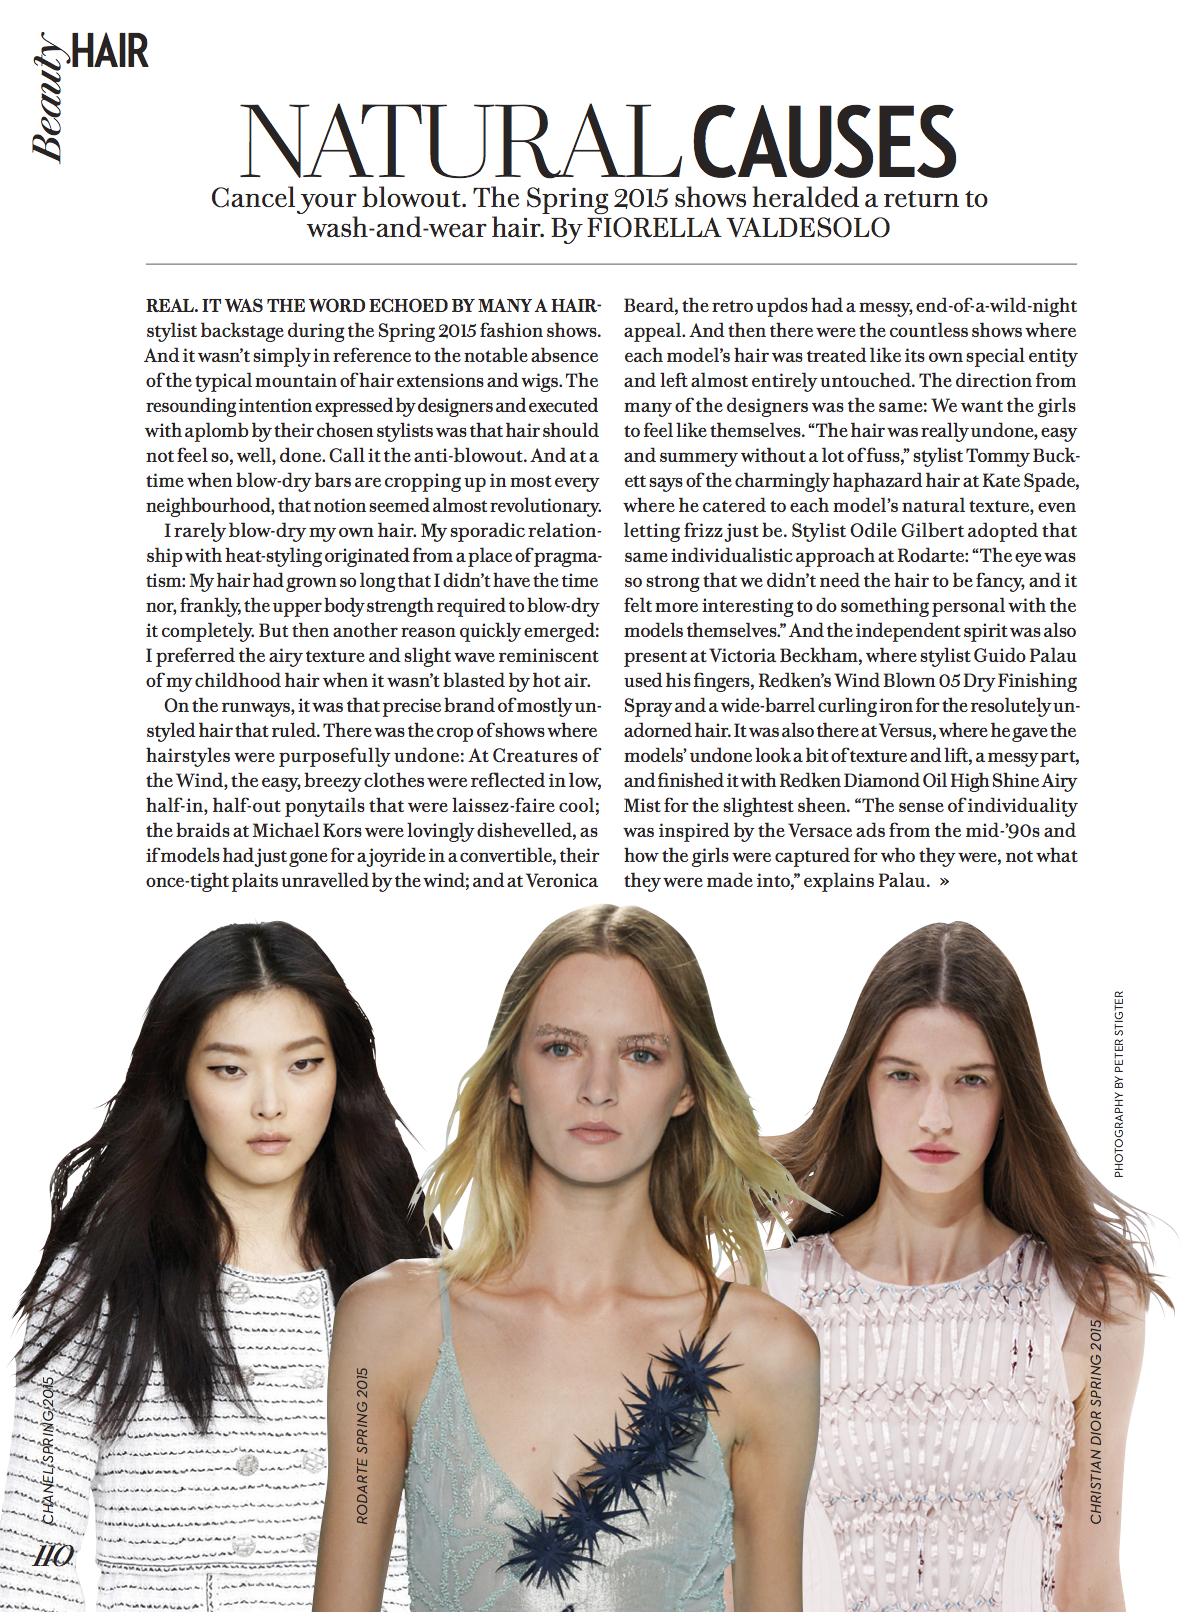 Fashion- Natural Causes April 2015 pg 1.jpg